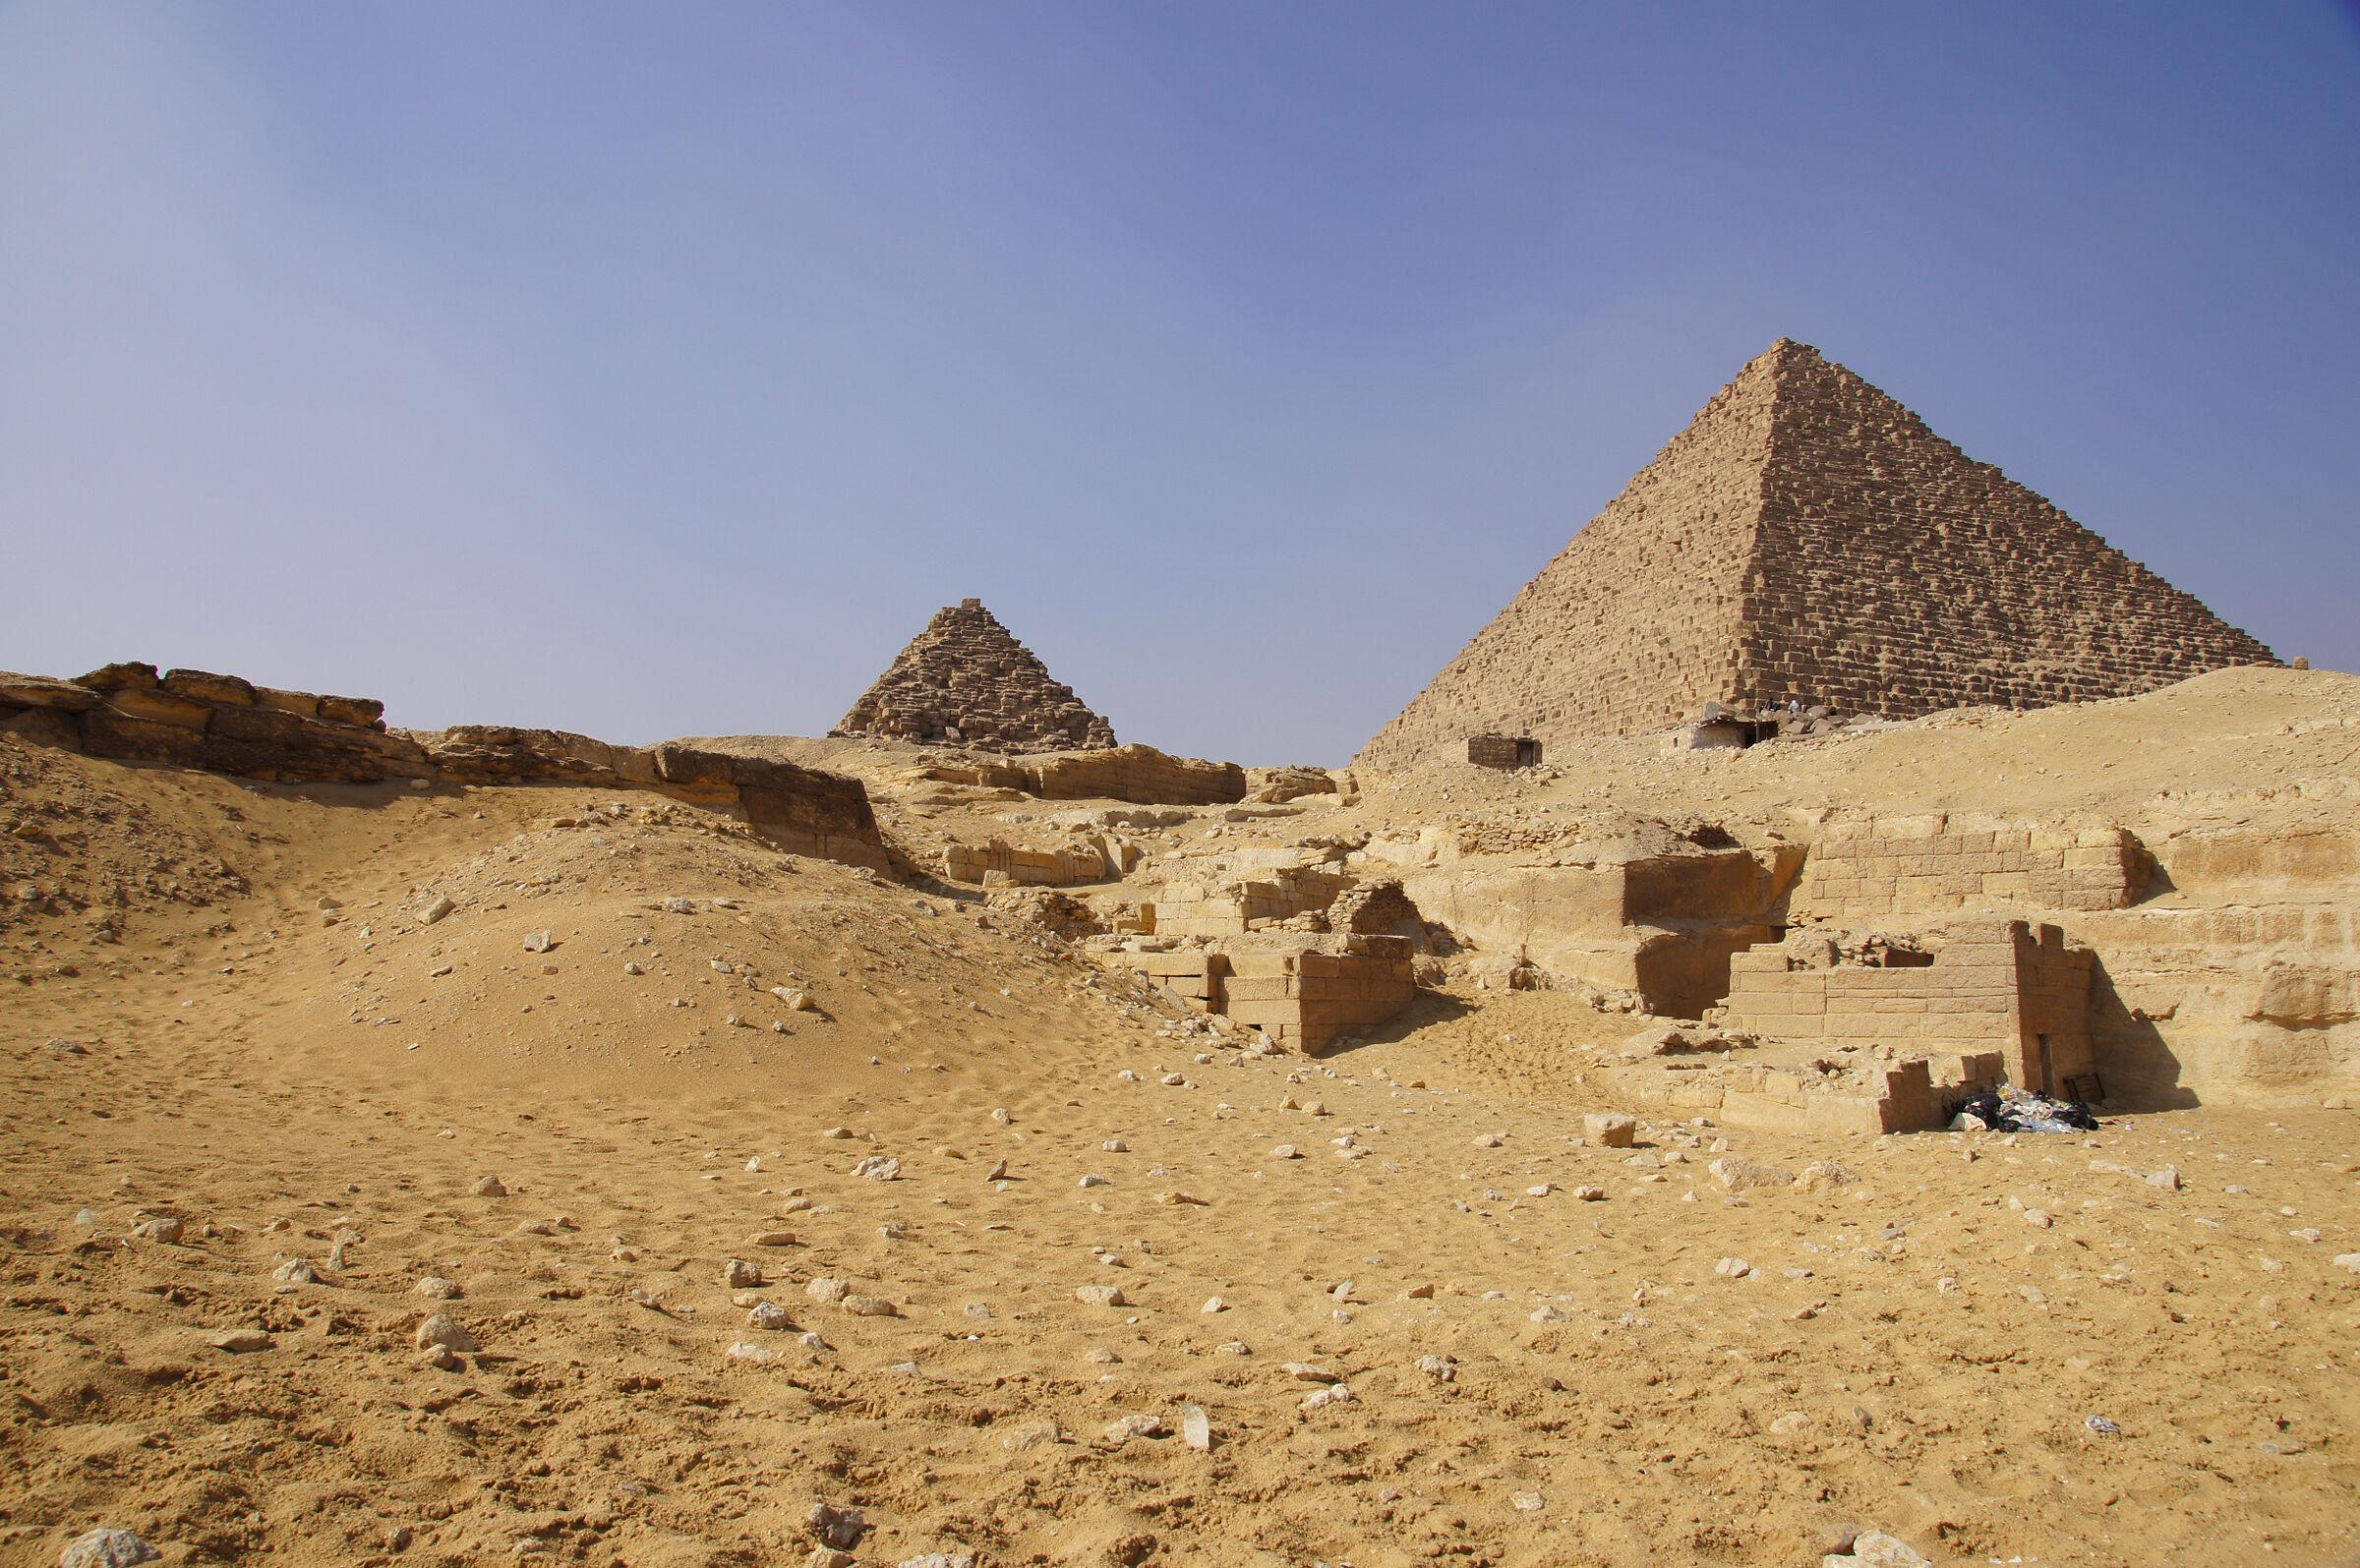 Menkaure Quarry Cemetery: Site: Giza; View: MQ 1, MQ 136, MQ 106, MQ 123, MQ 105, MQ 120, MQ 134, G III-a, Menkaure Pyramid